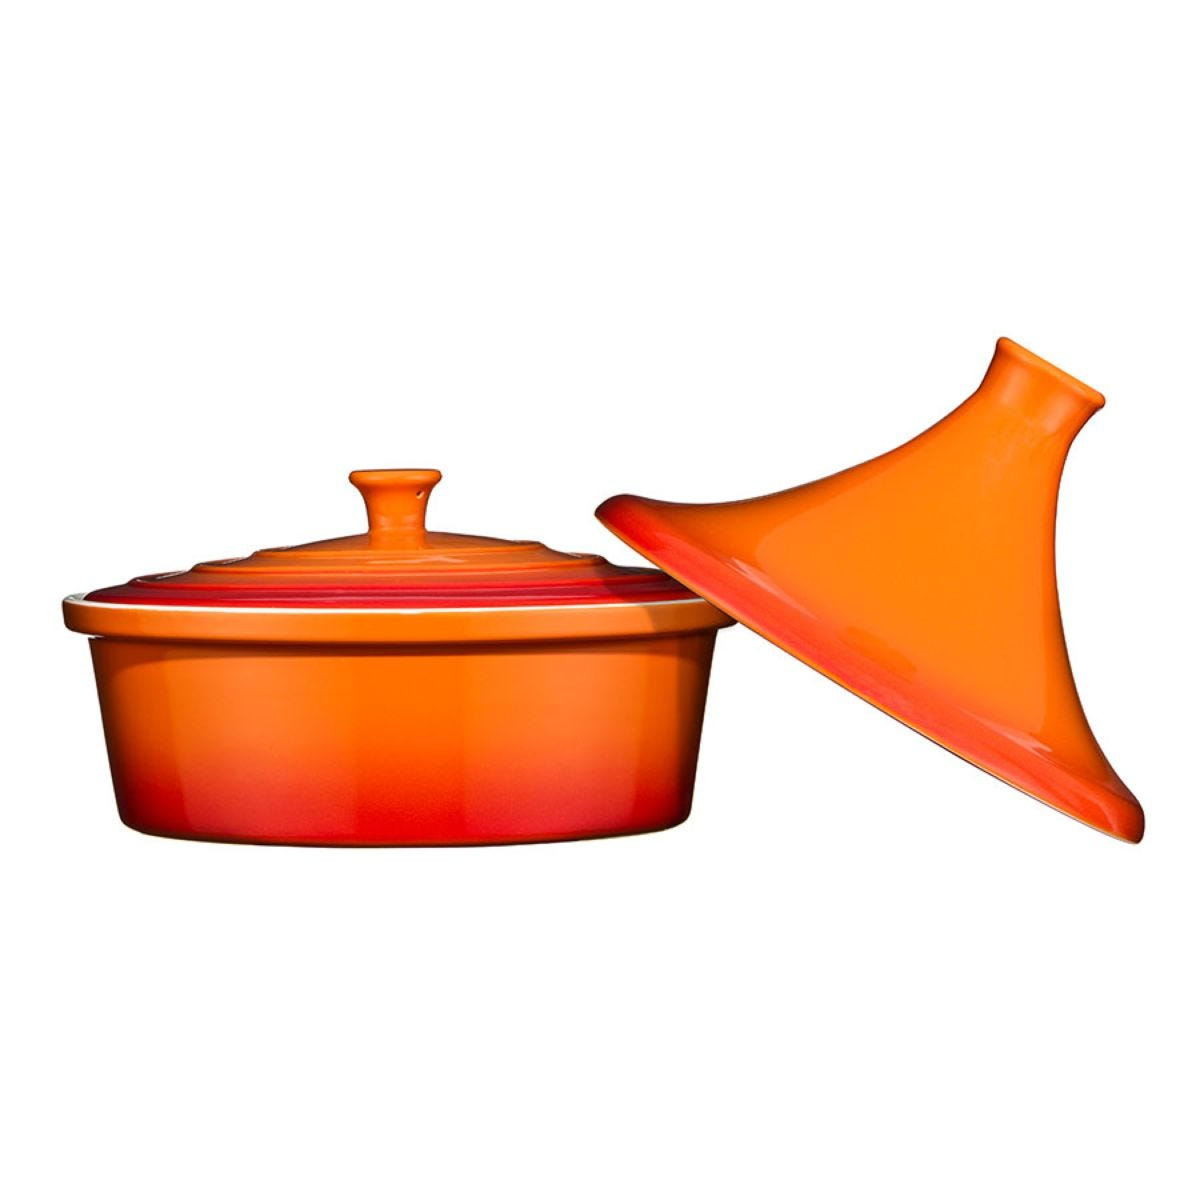 Premier 2 in 1 Casserole Dish - Orange